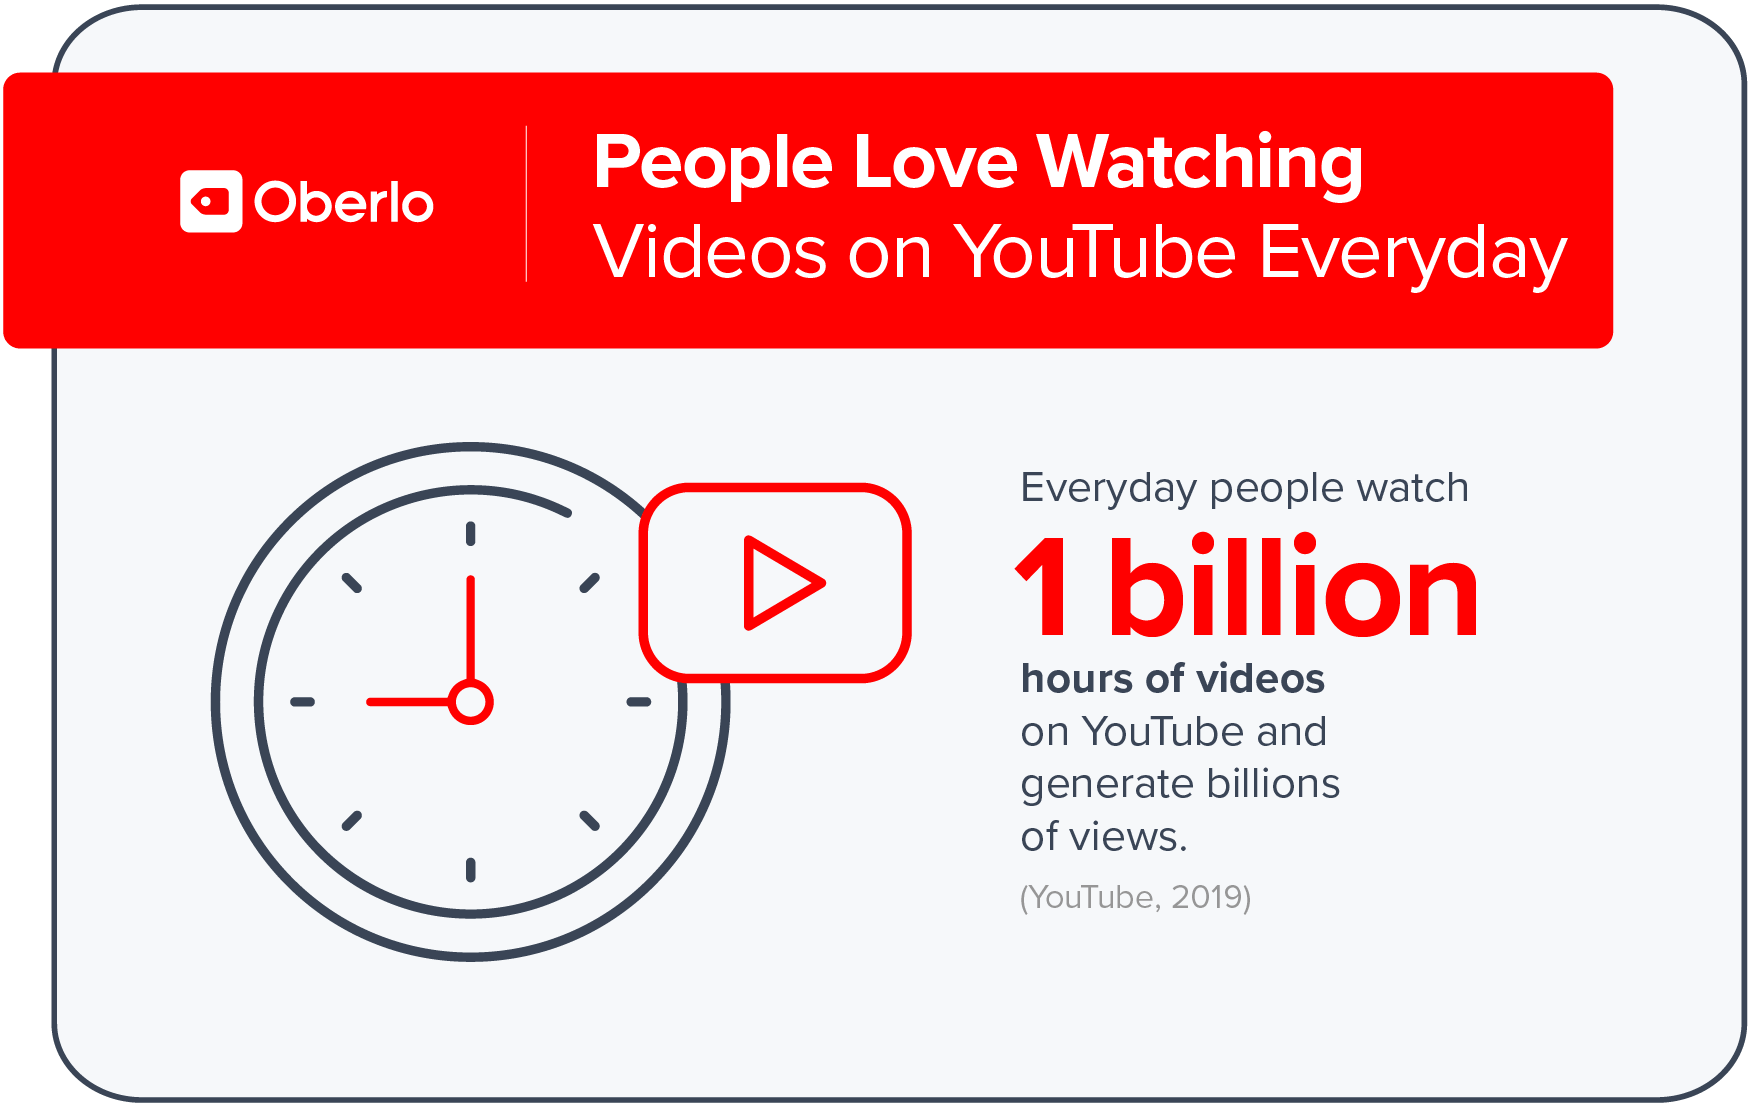 Youtube-generates-1-billion-hours-of-videos-05